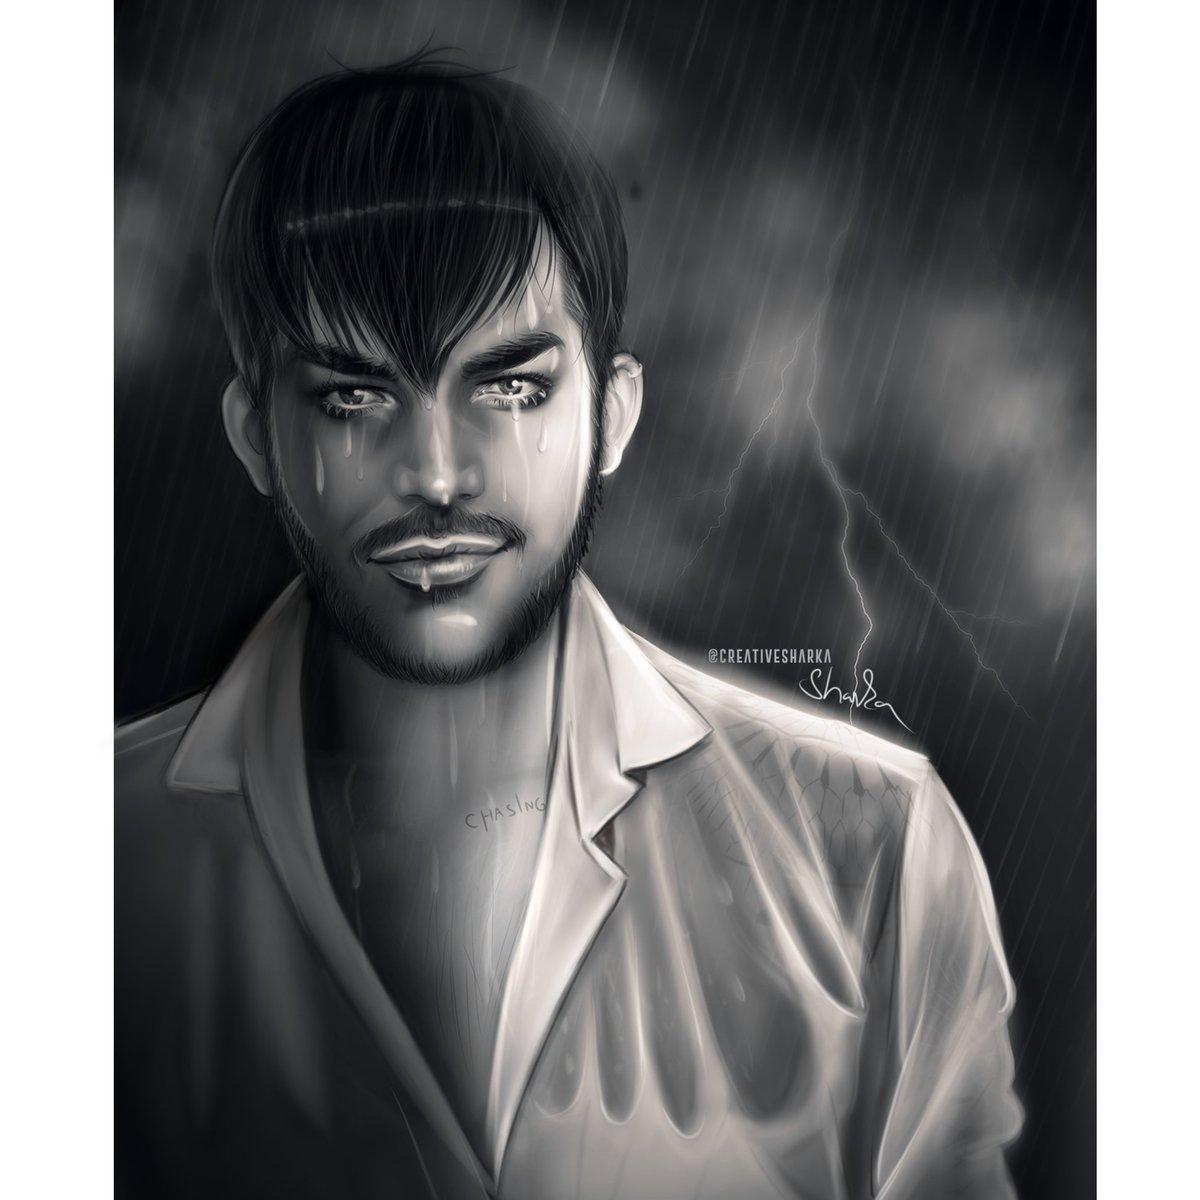 New digital painting &quot;rainy day&quot; @adamlambert #adamlambert #fanart IG: https://www. instagram.com/p/BZKJKvRlTg2/  &nbsp;  <br>http://pic.twitter.com/zNuniVN066